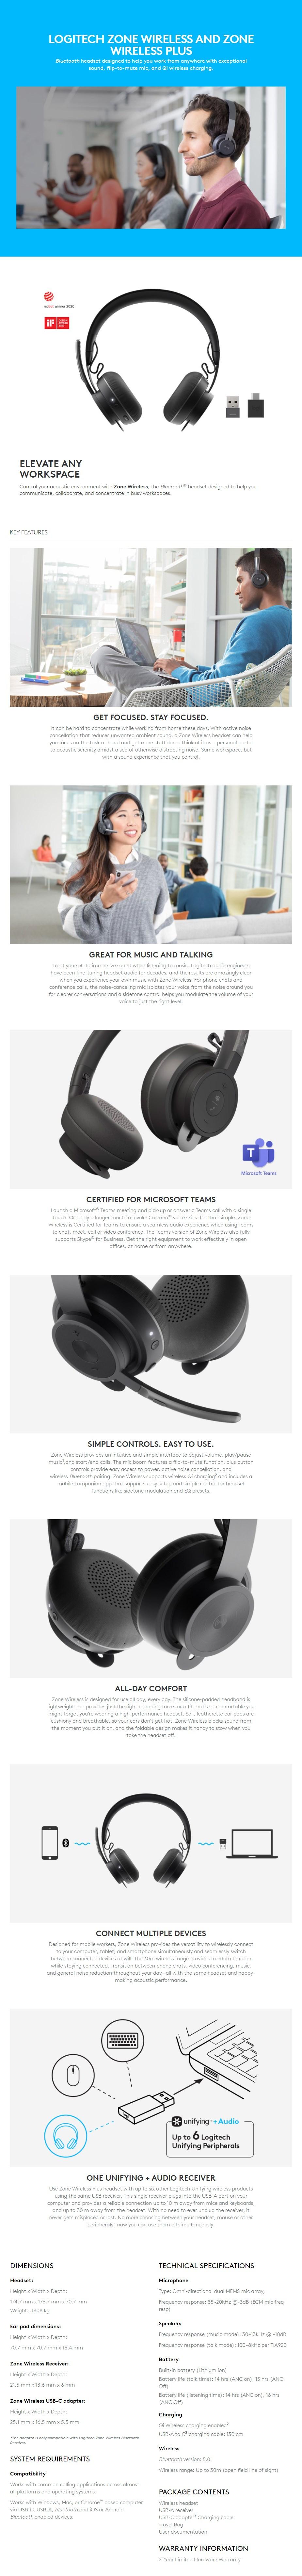 logitech-zone-wireless-bluetooth-nc-stereo-headset-microsoft-ac40583-6.jpg